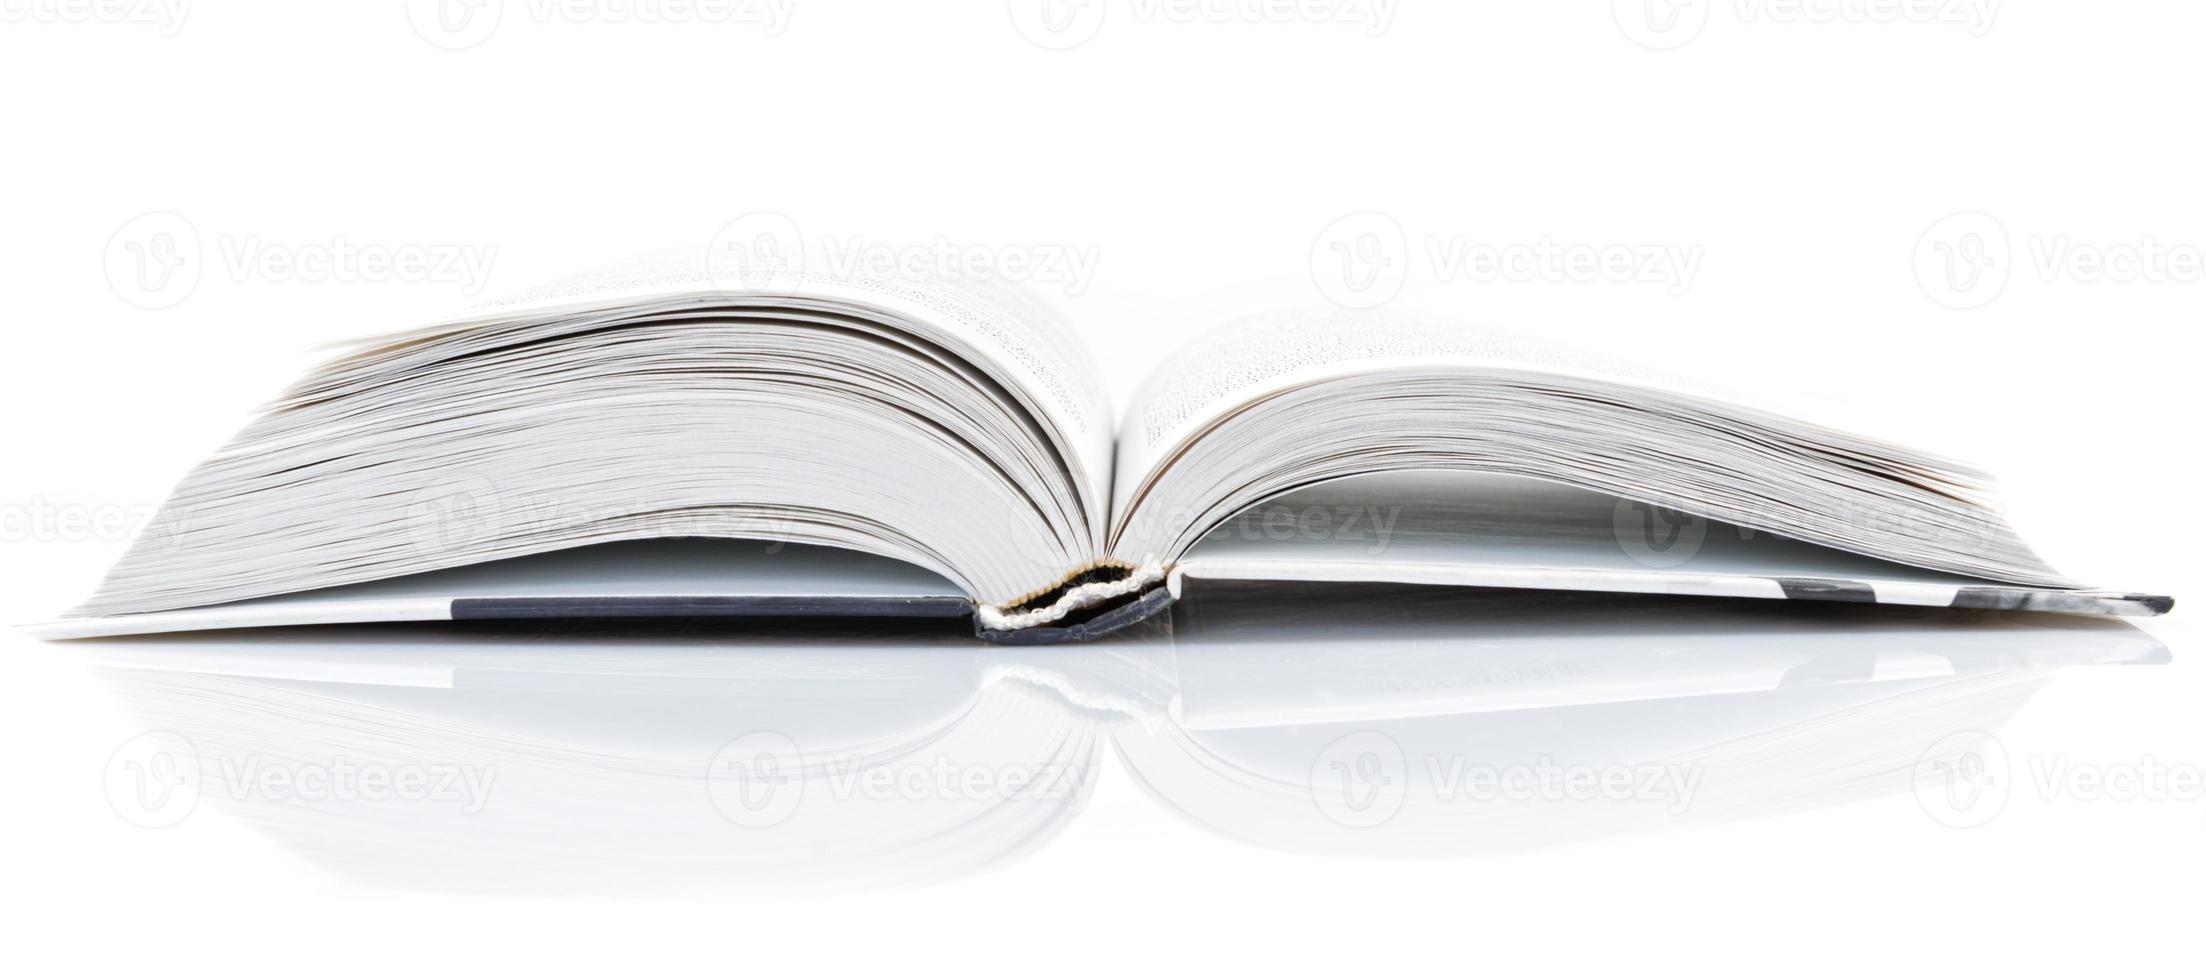 livro aberto sobre fundo branco foto